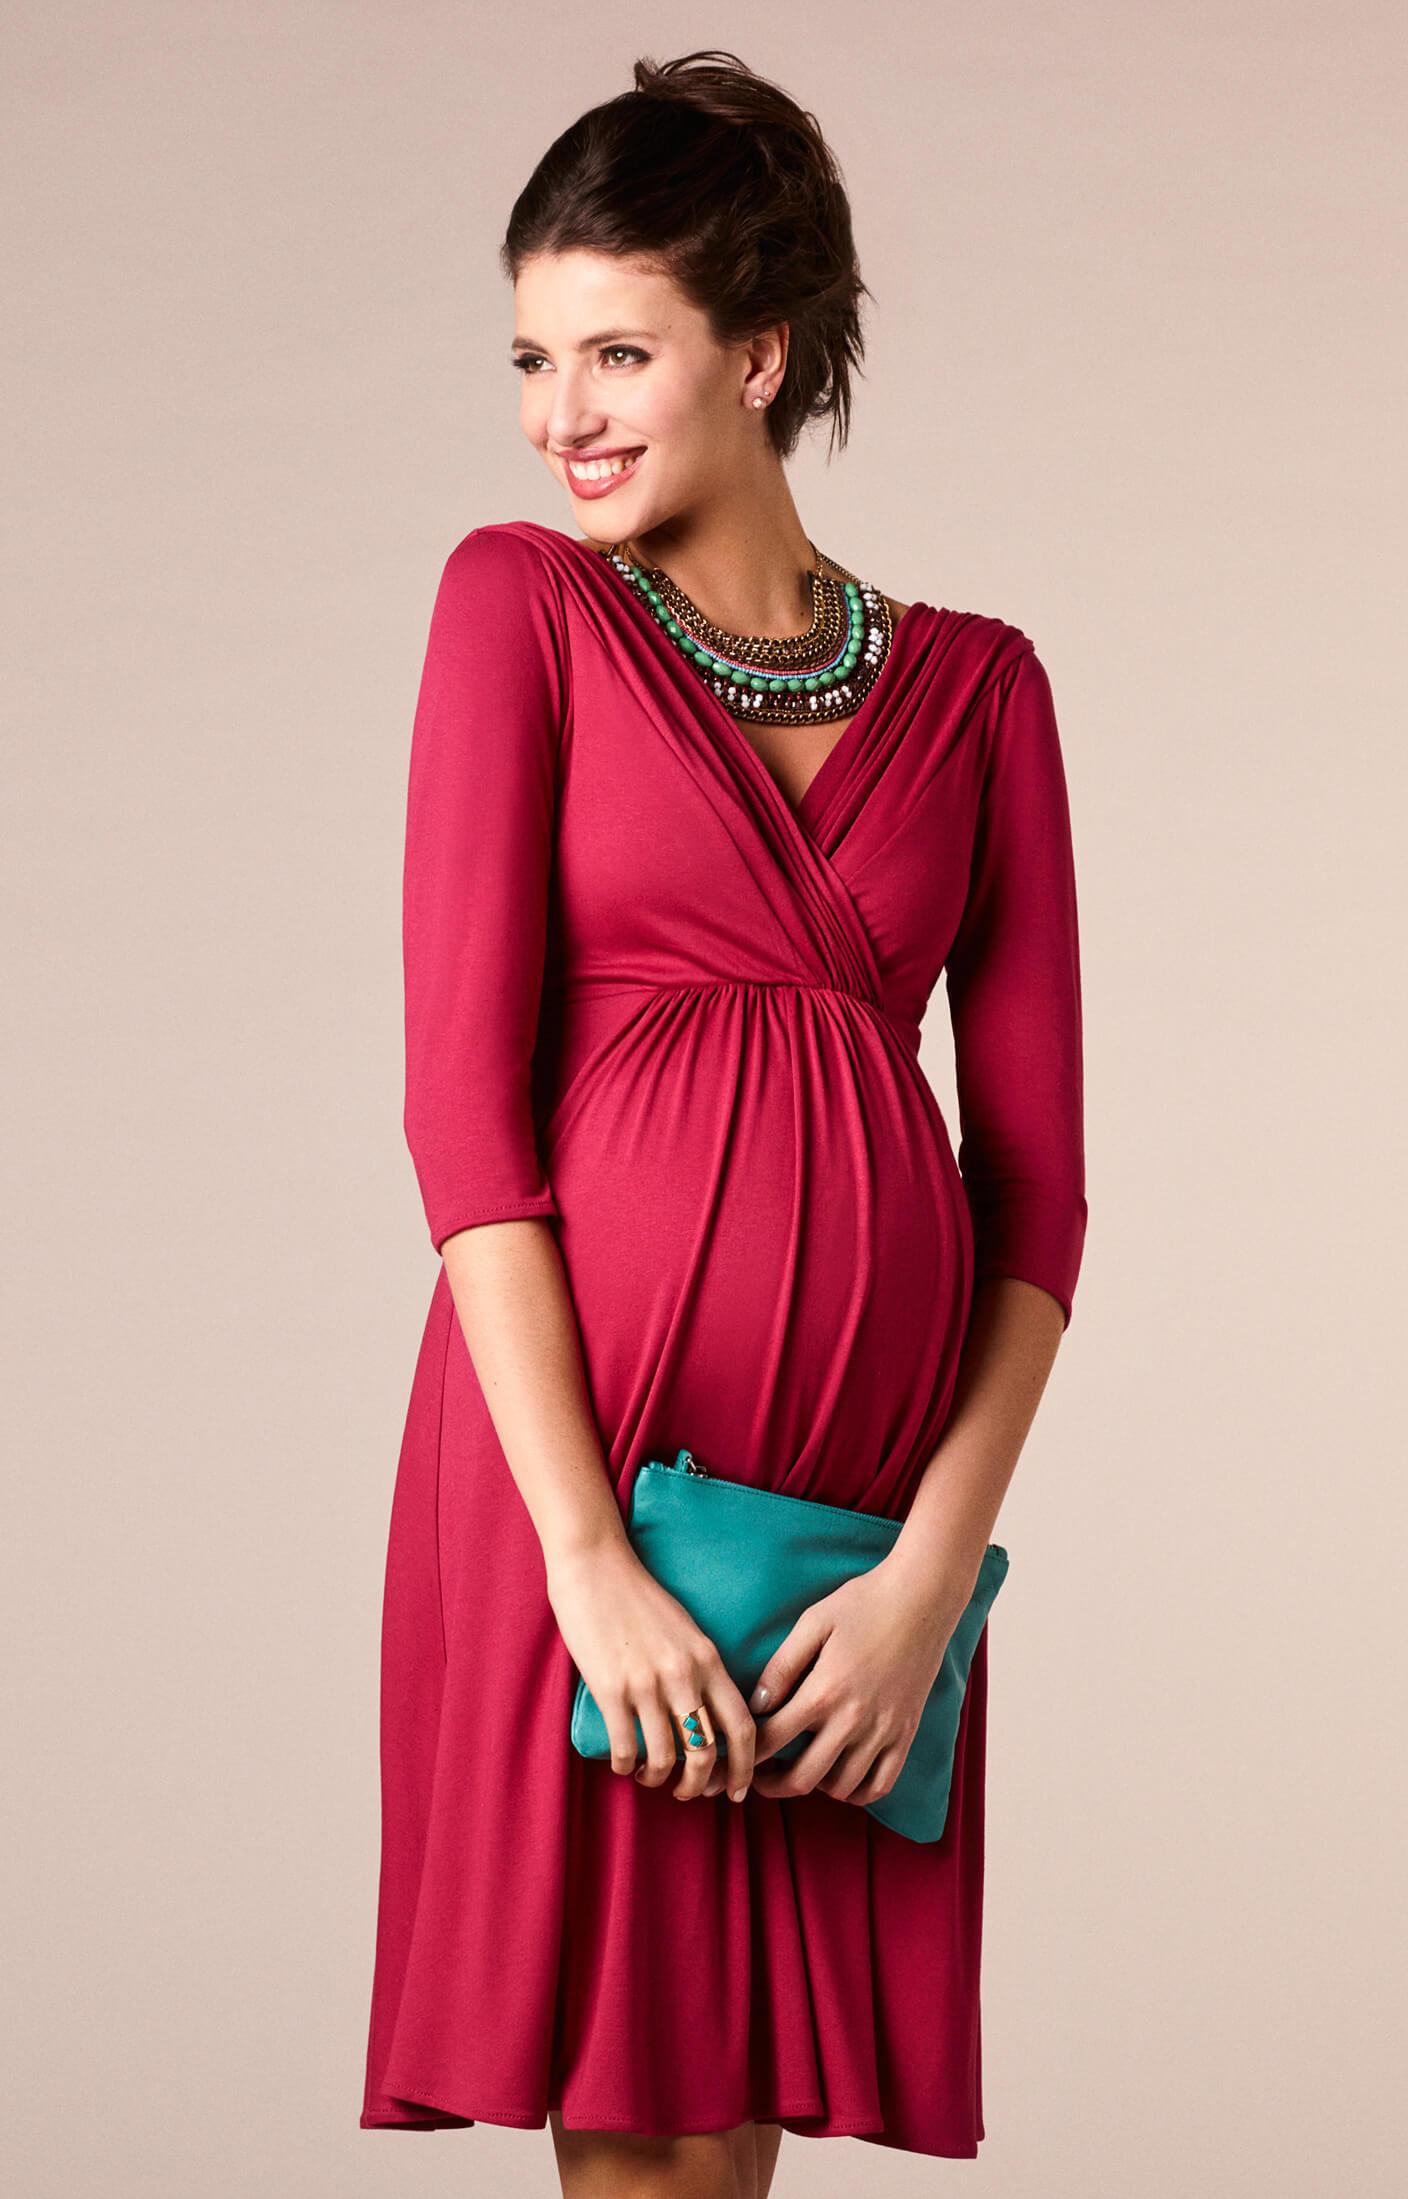 fe03995a08 Willow Maternity Dress Raspberry Pink - Maternity Wedding Dresses ...